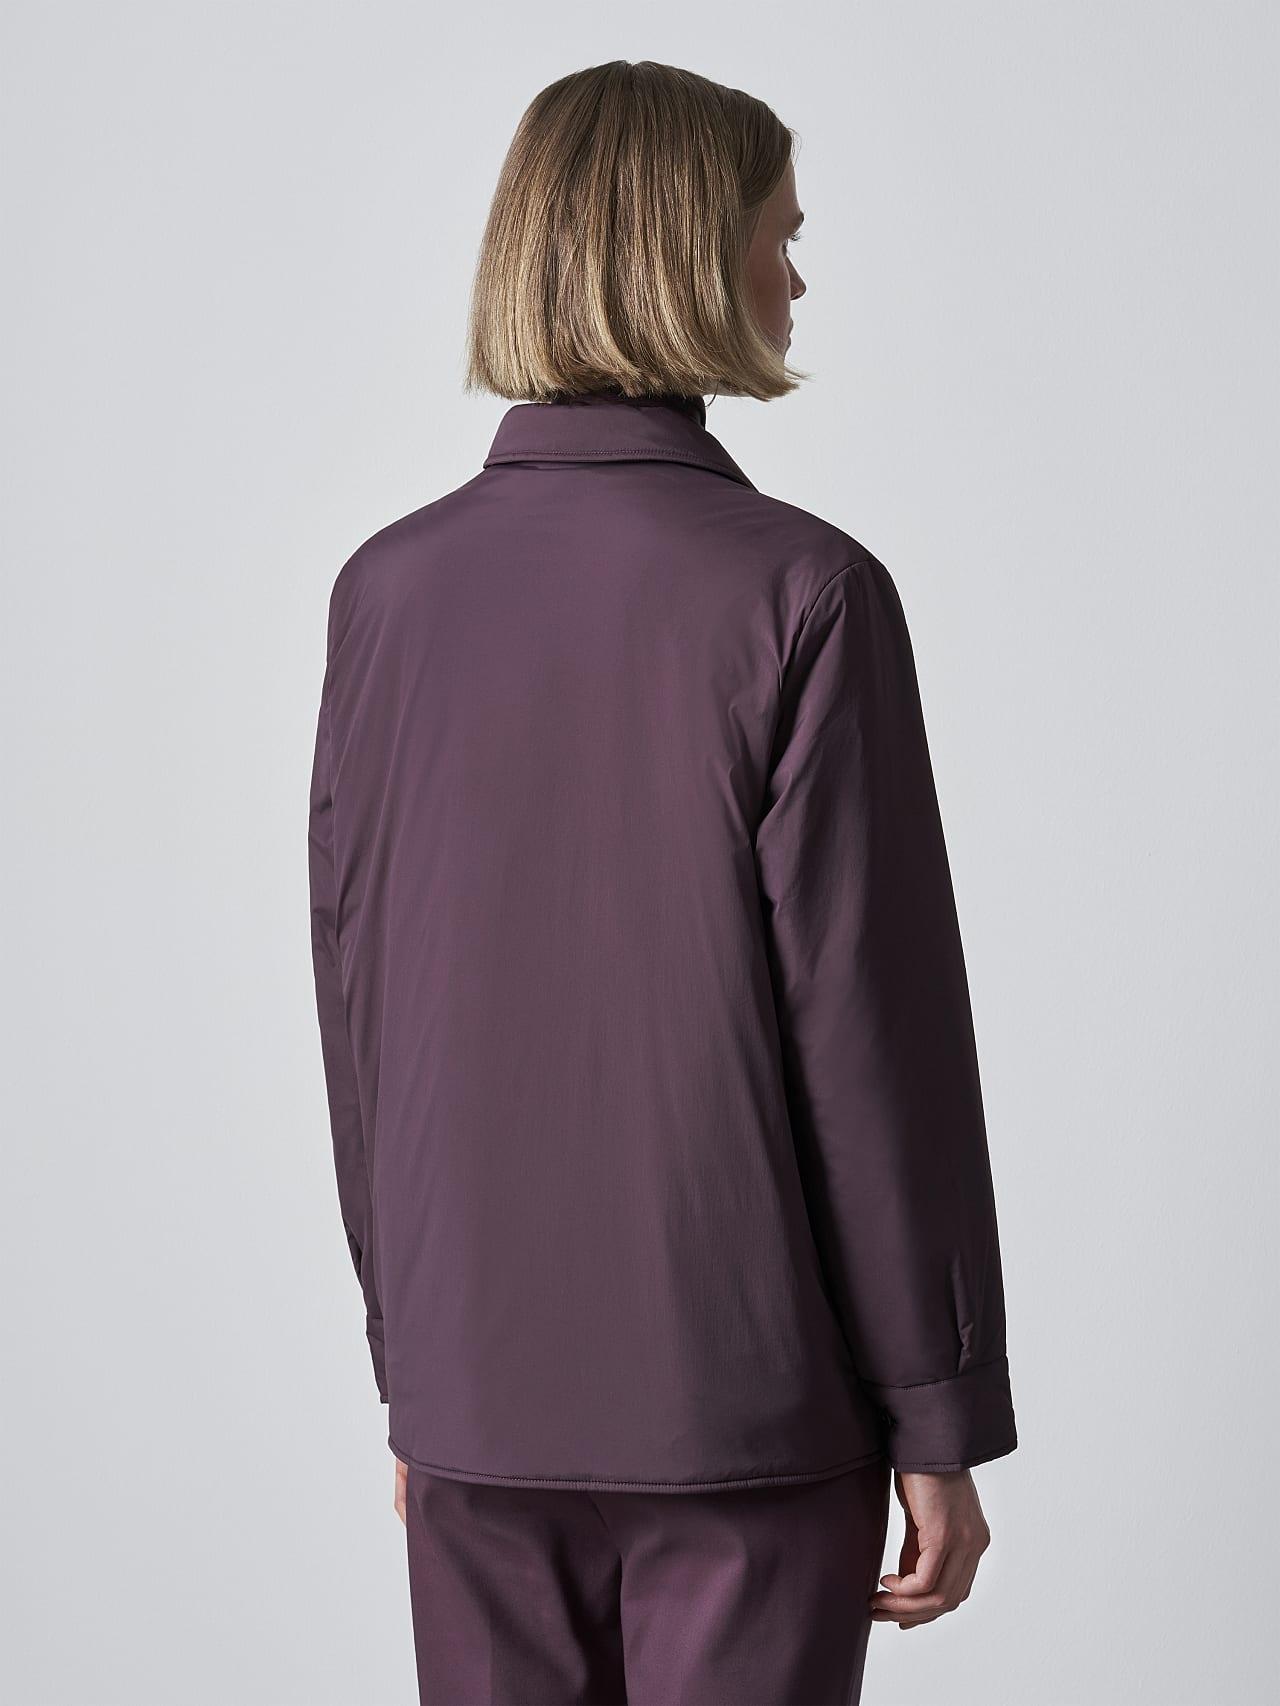 OSHEN V1.Y5.02 PrimaLoft® Overshirt Jacket Burgundy Front Main Alpha Tauri